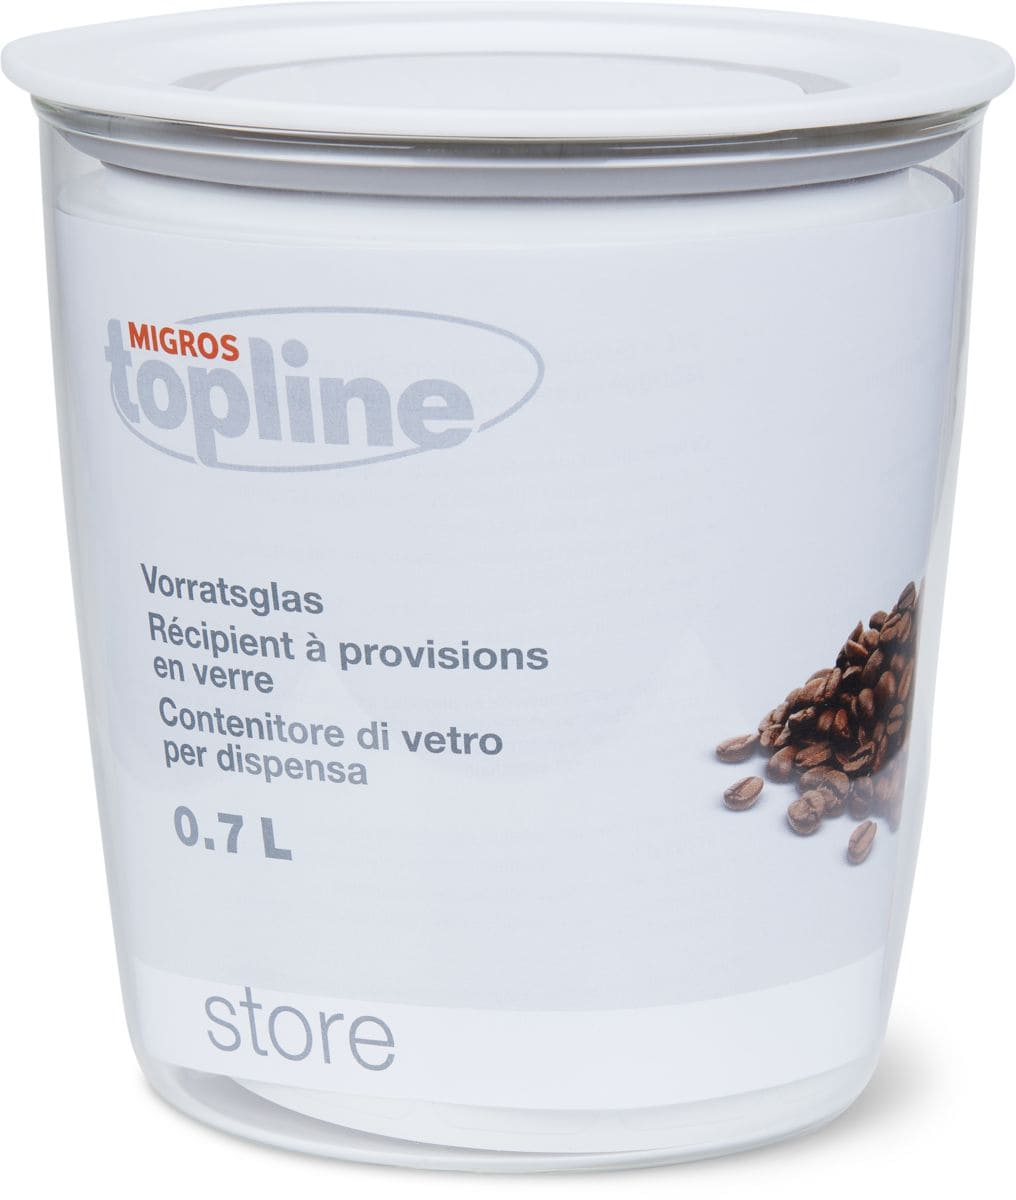 M-Topline STORE Vorratsglas 0.7L